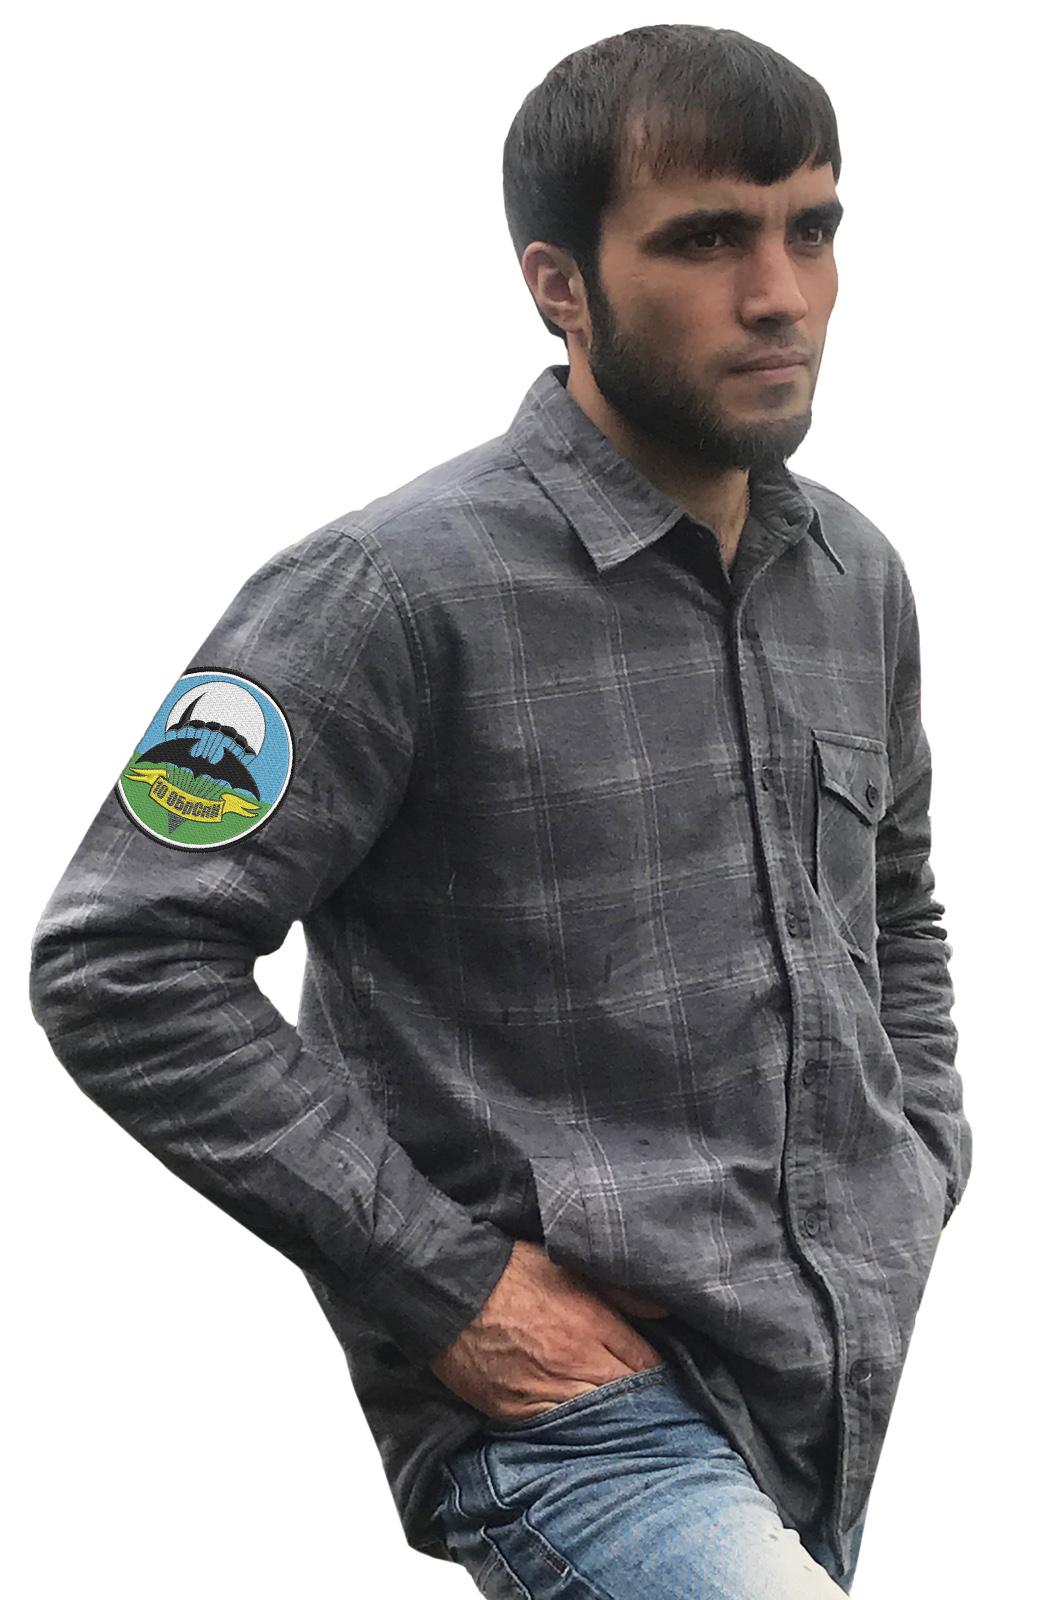 Мужская рубашка 10 ОБрСпН